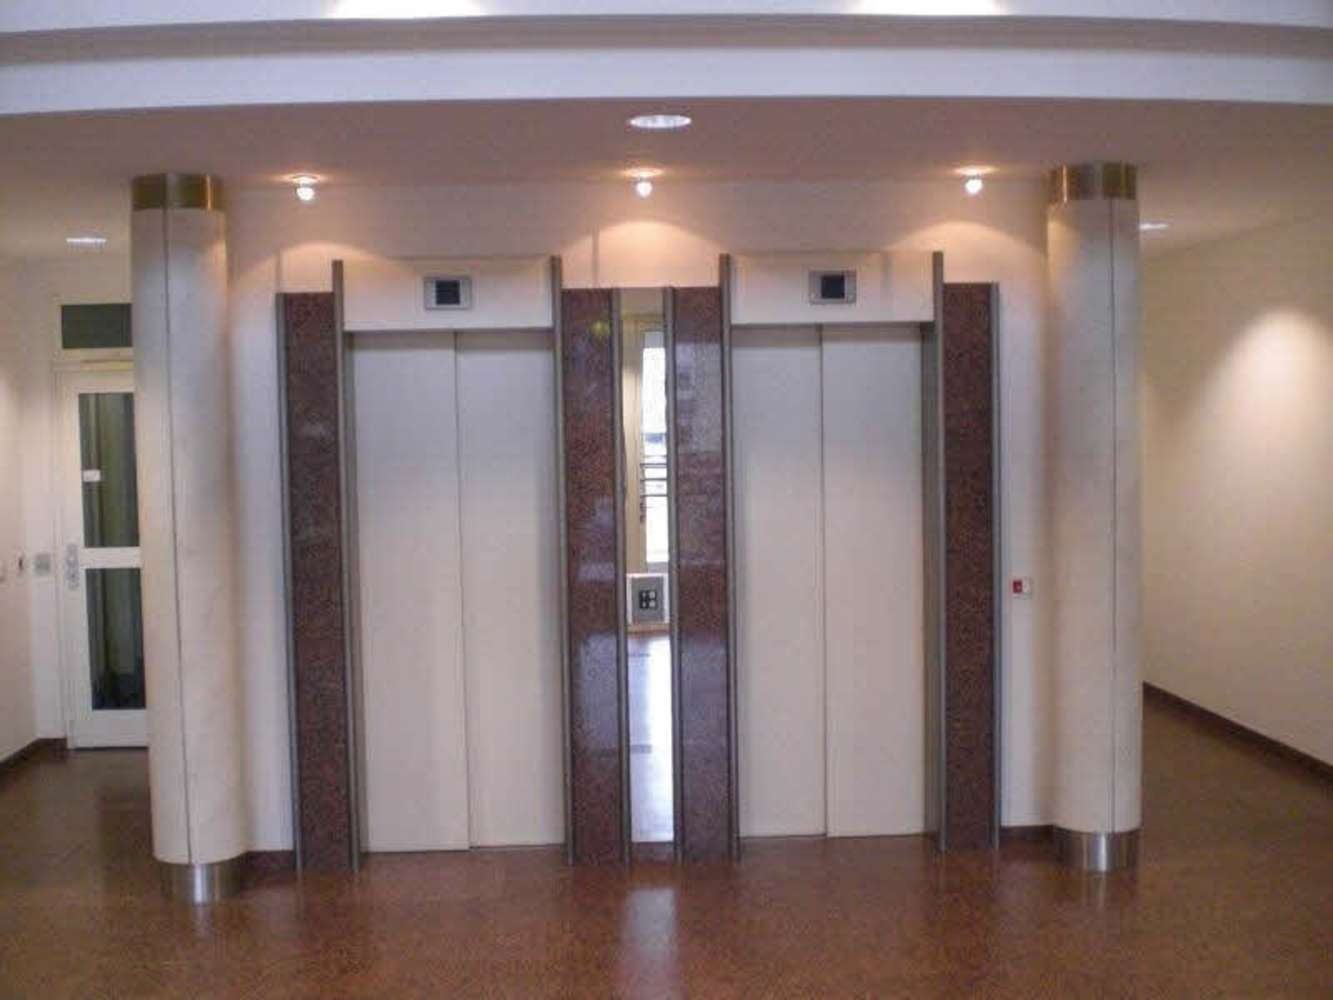 Büros Hamburg, 22453 - Büro - Hamburg, Niendorf - H0347 - 9388074